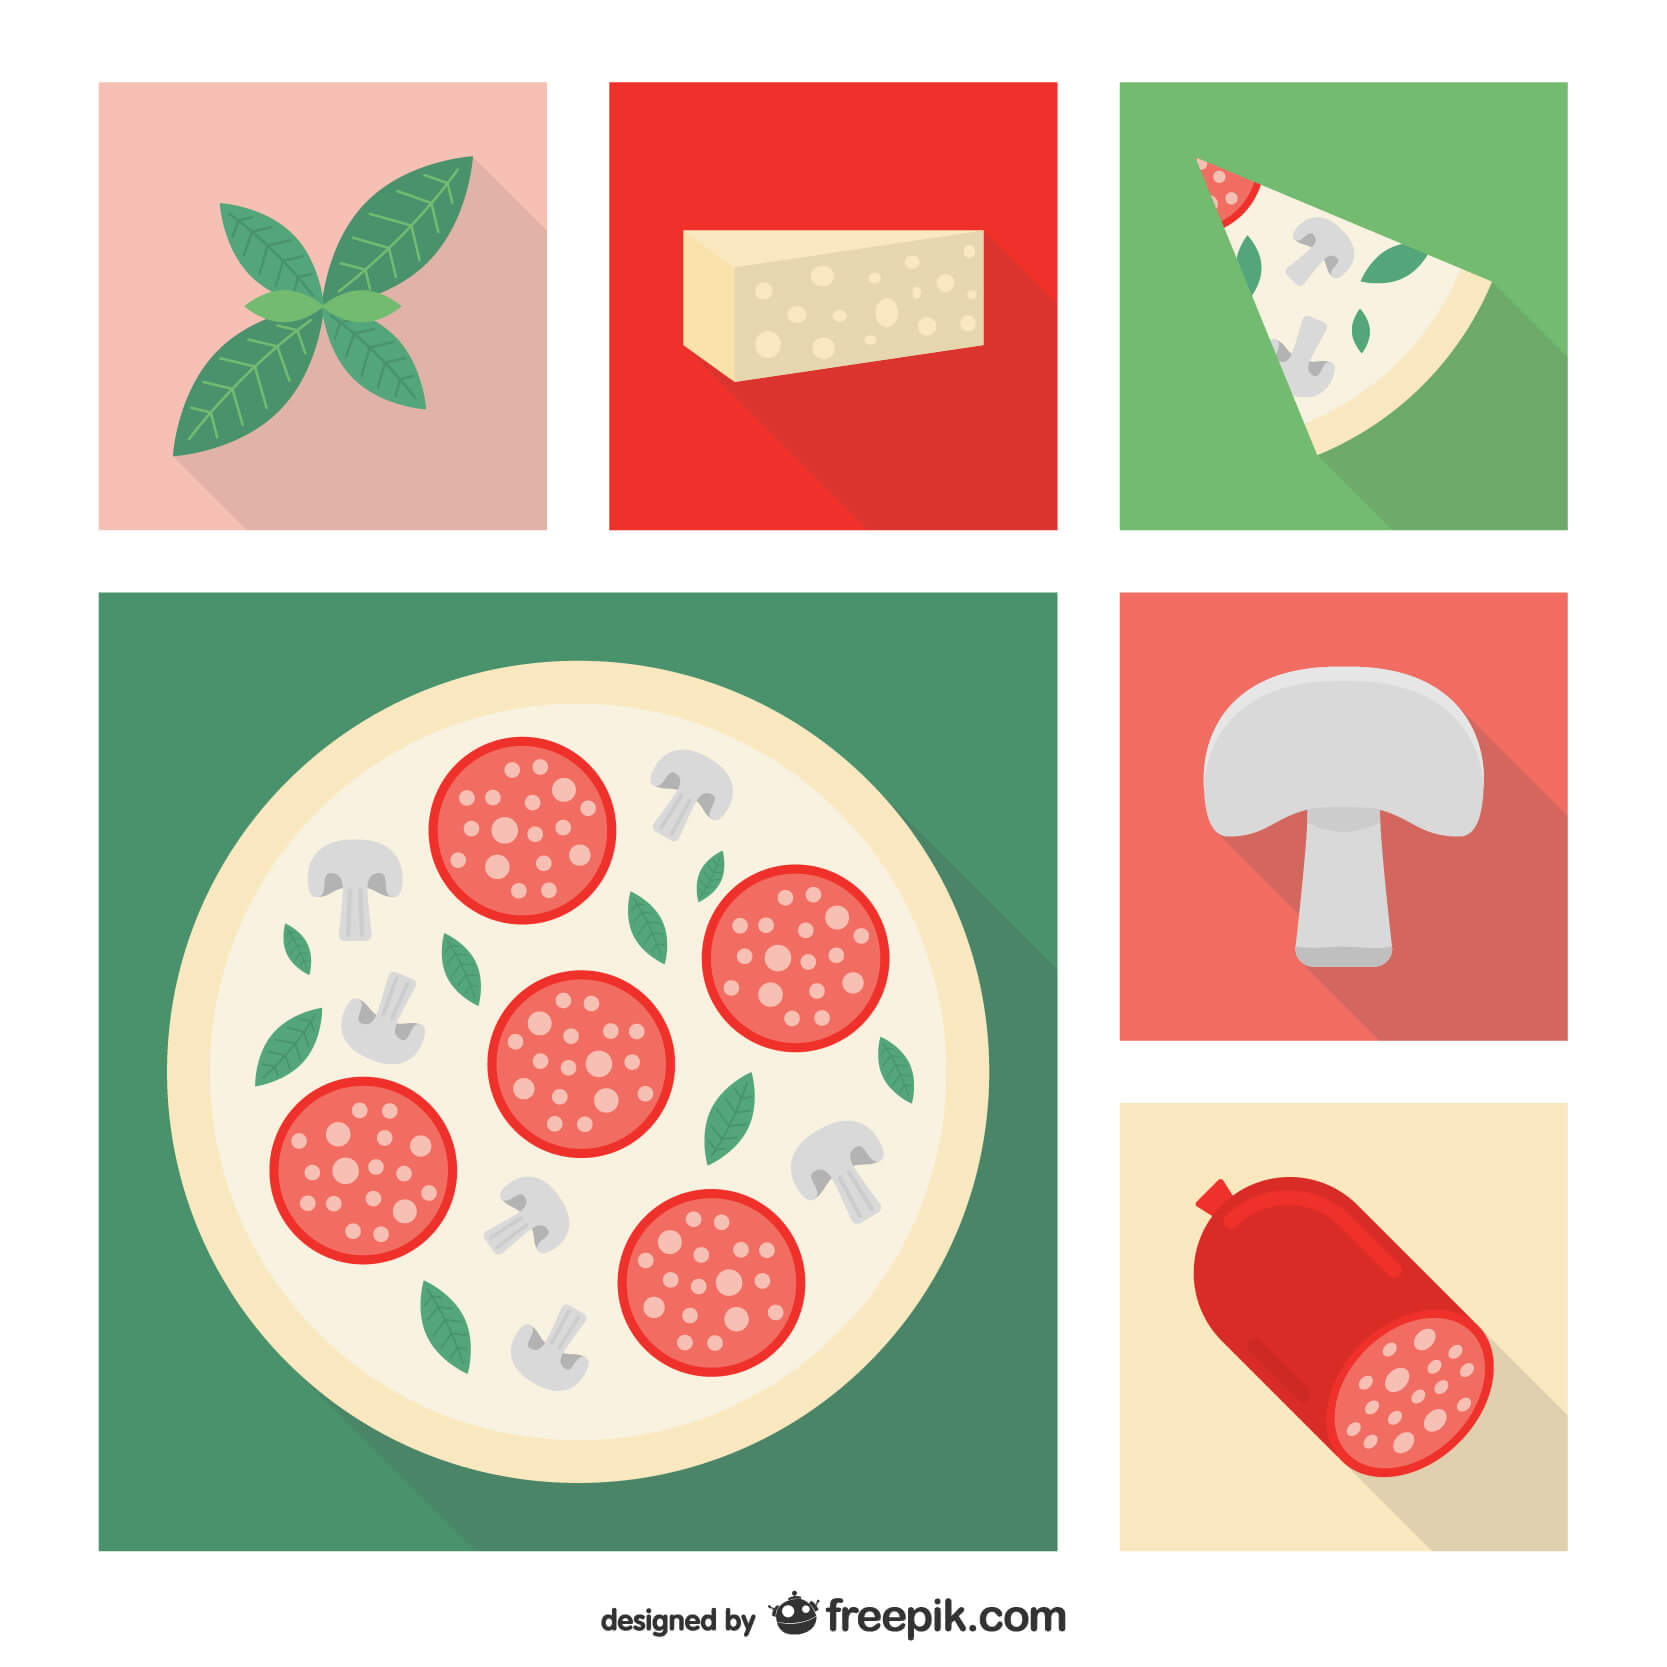 34. proiect pizza